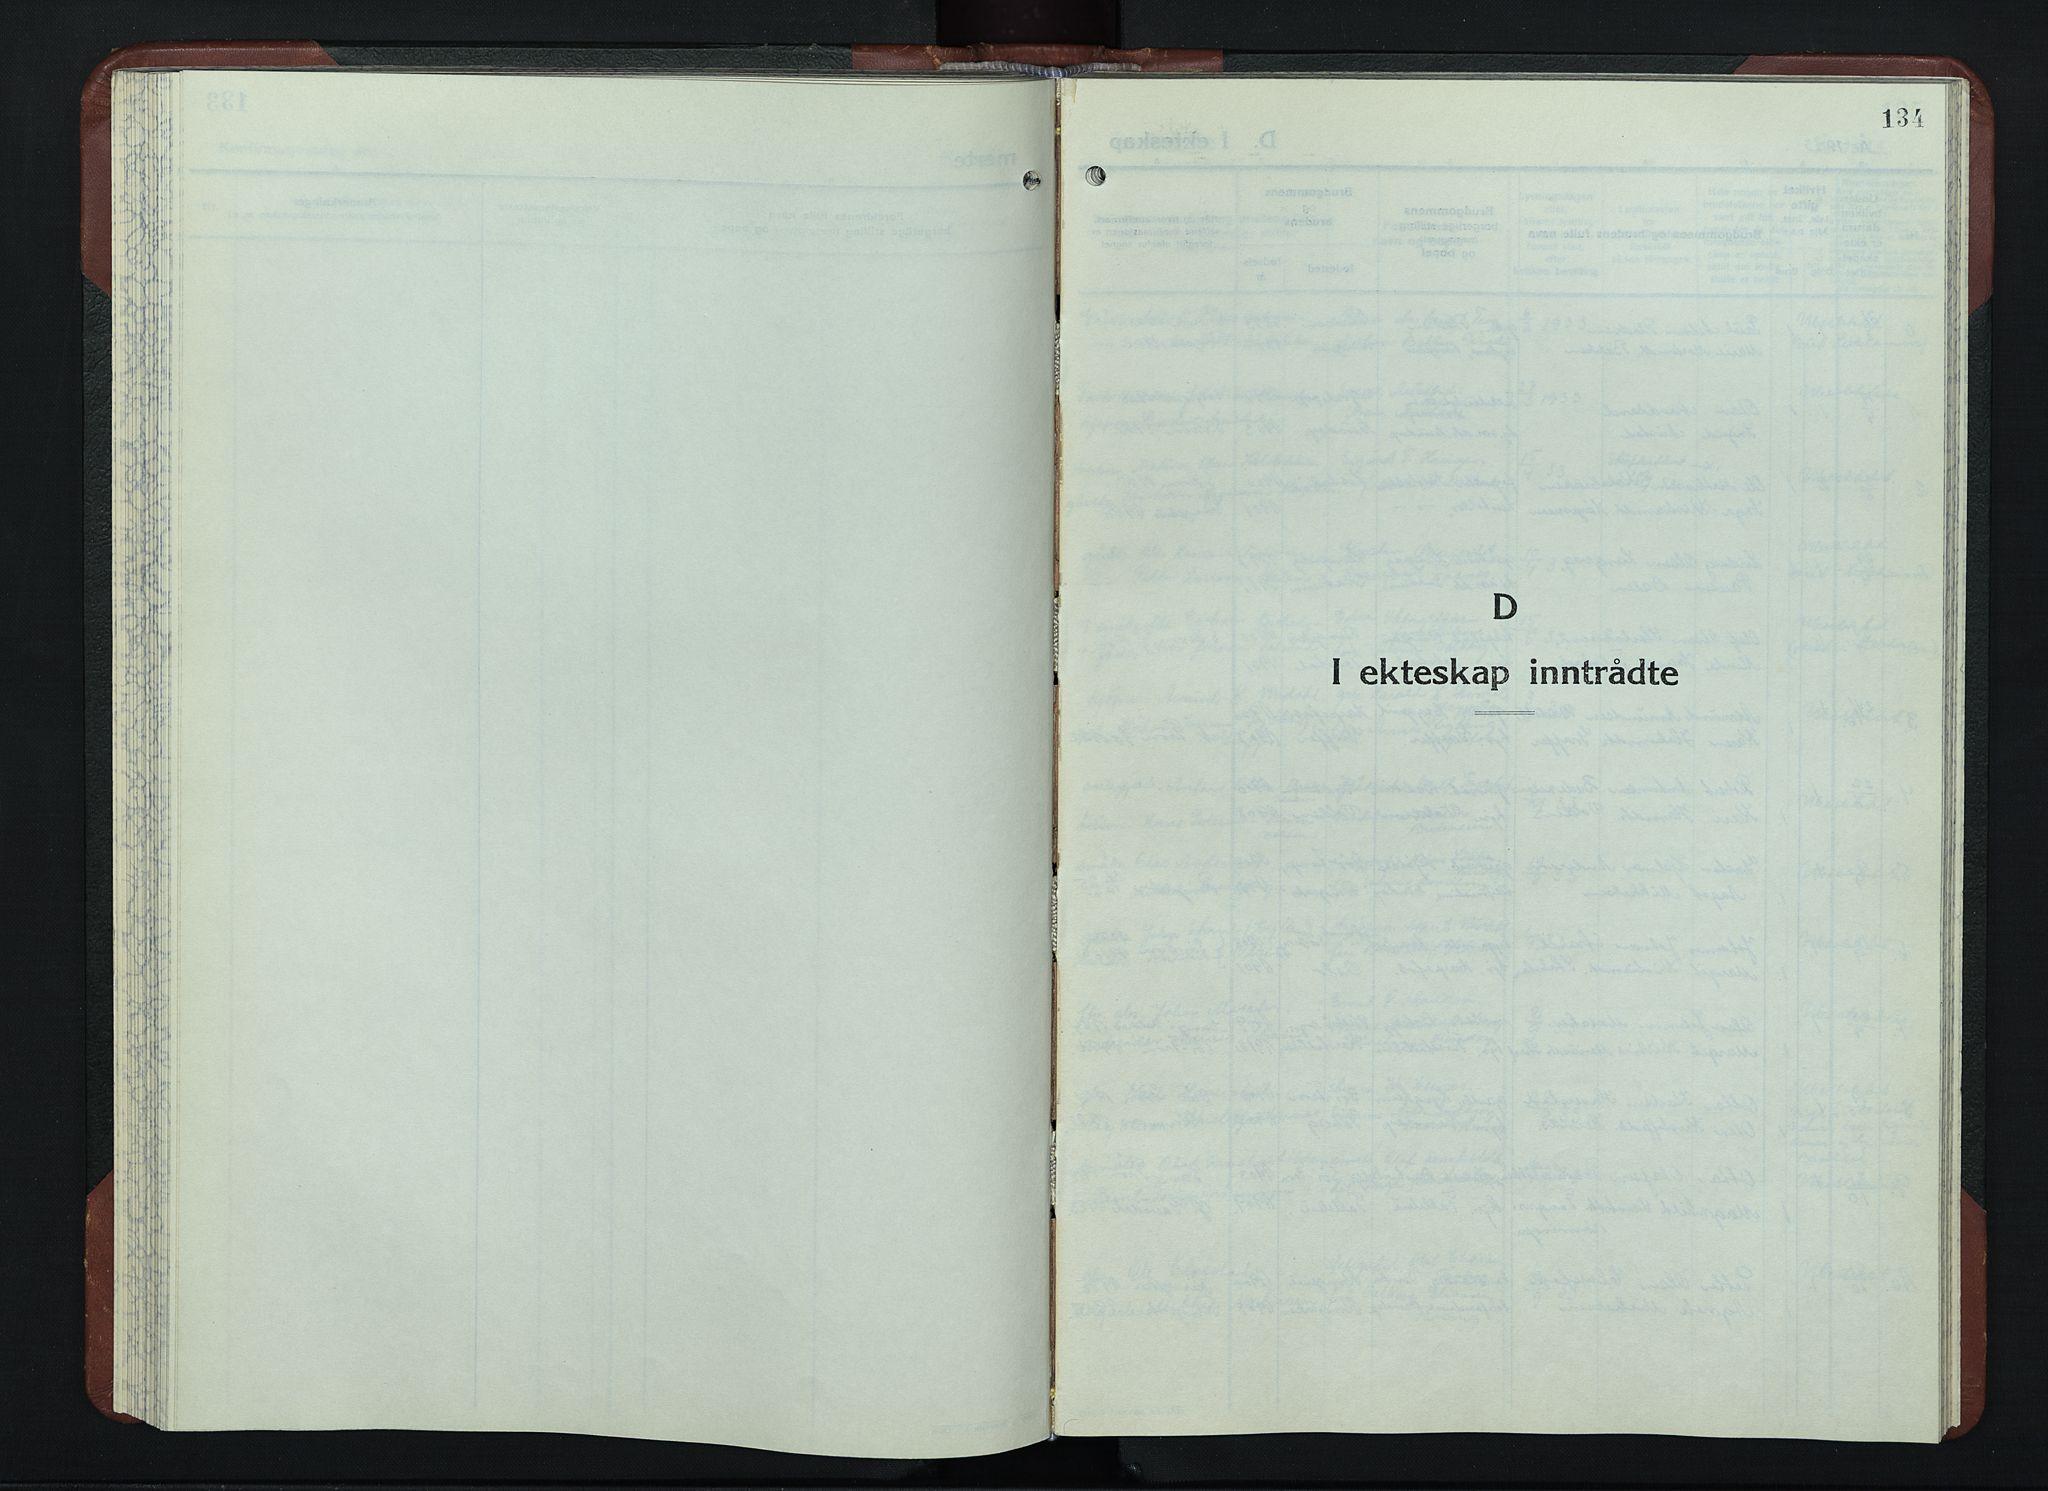 SAH, Sør-Fron prestekontor, H/Ha/Hab/L0006: Klokkerbok nr. 6, 1933-1948, s. 134